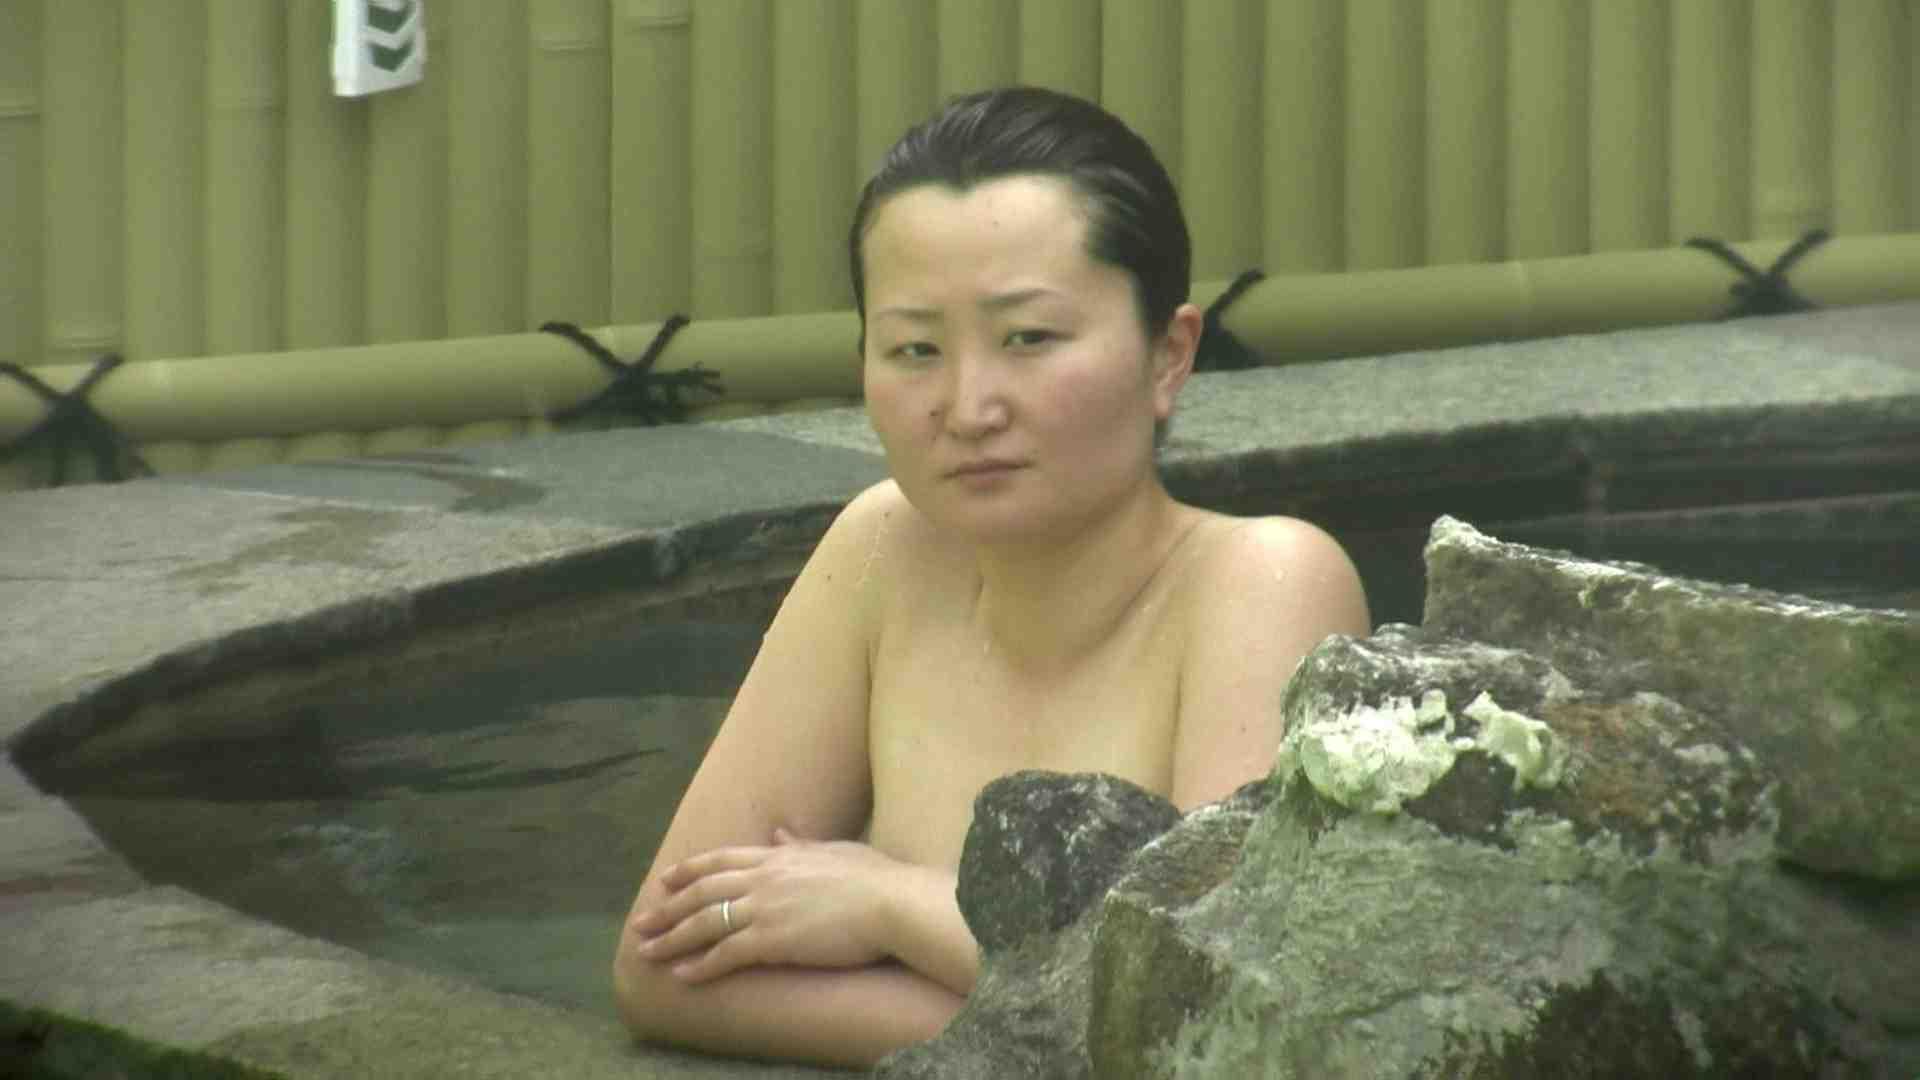 Aquaな露天風呂Vol.632 盗撮 | OLセックス  70画像 64